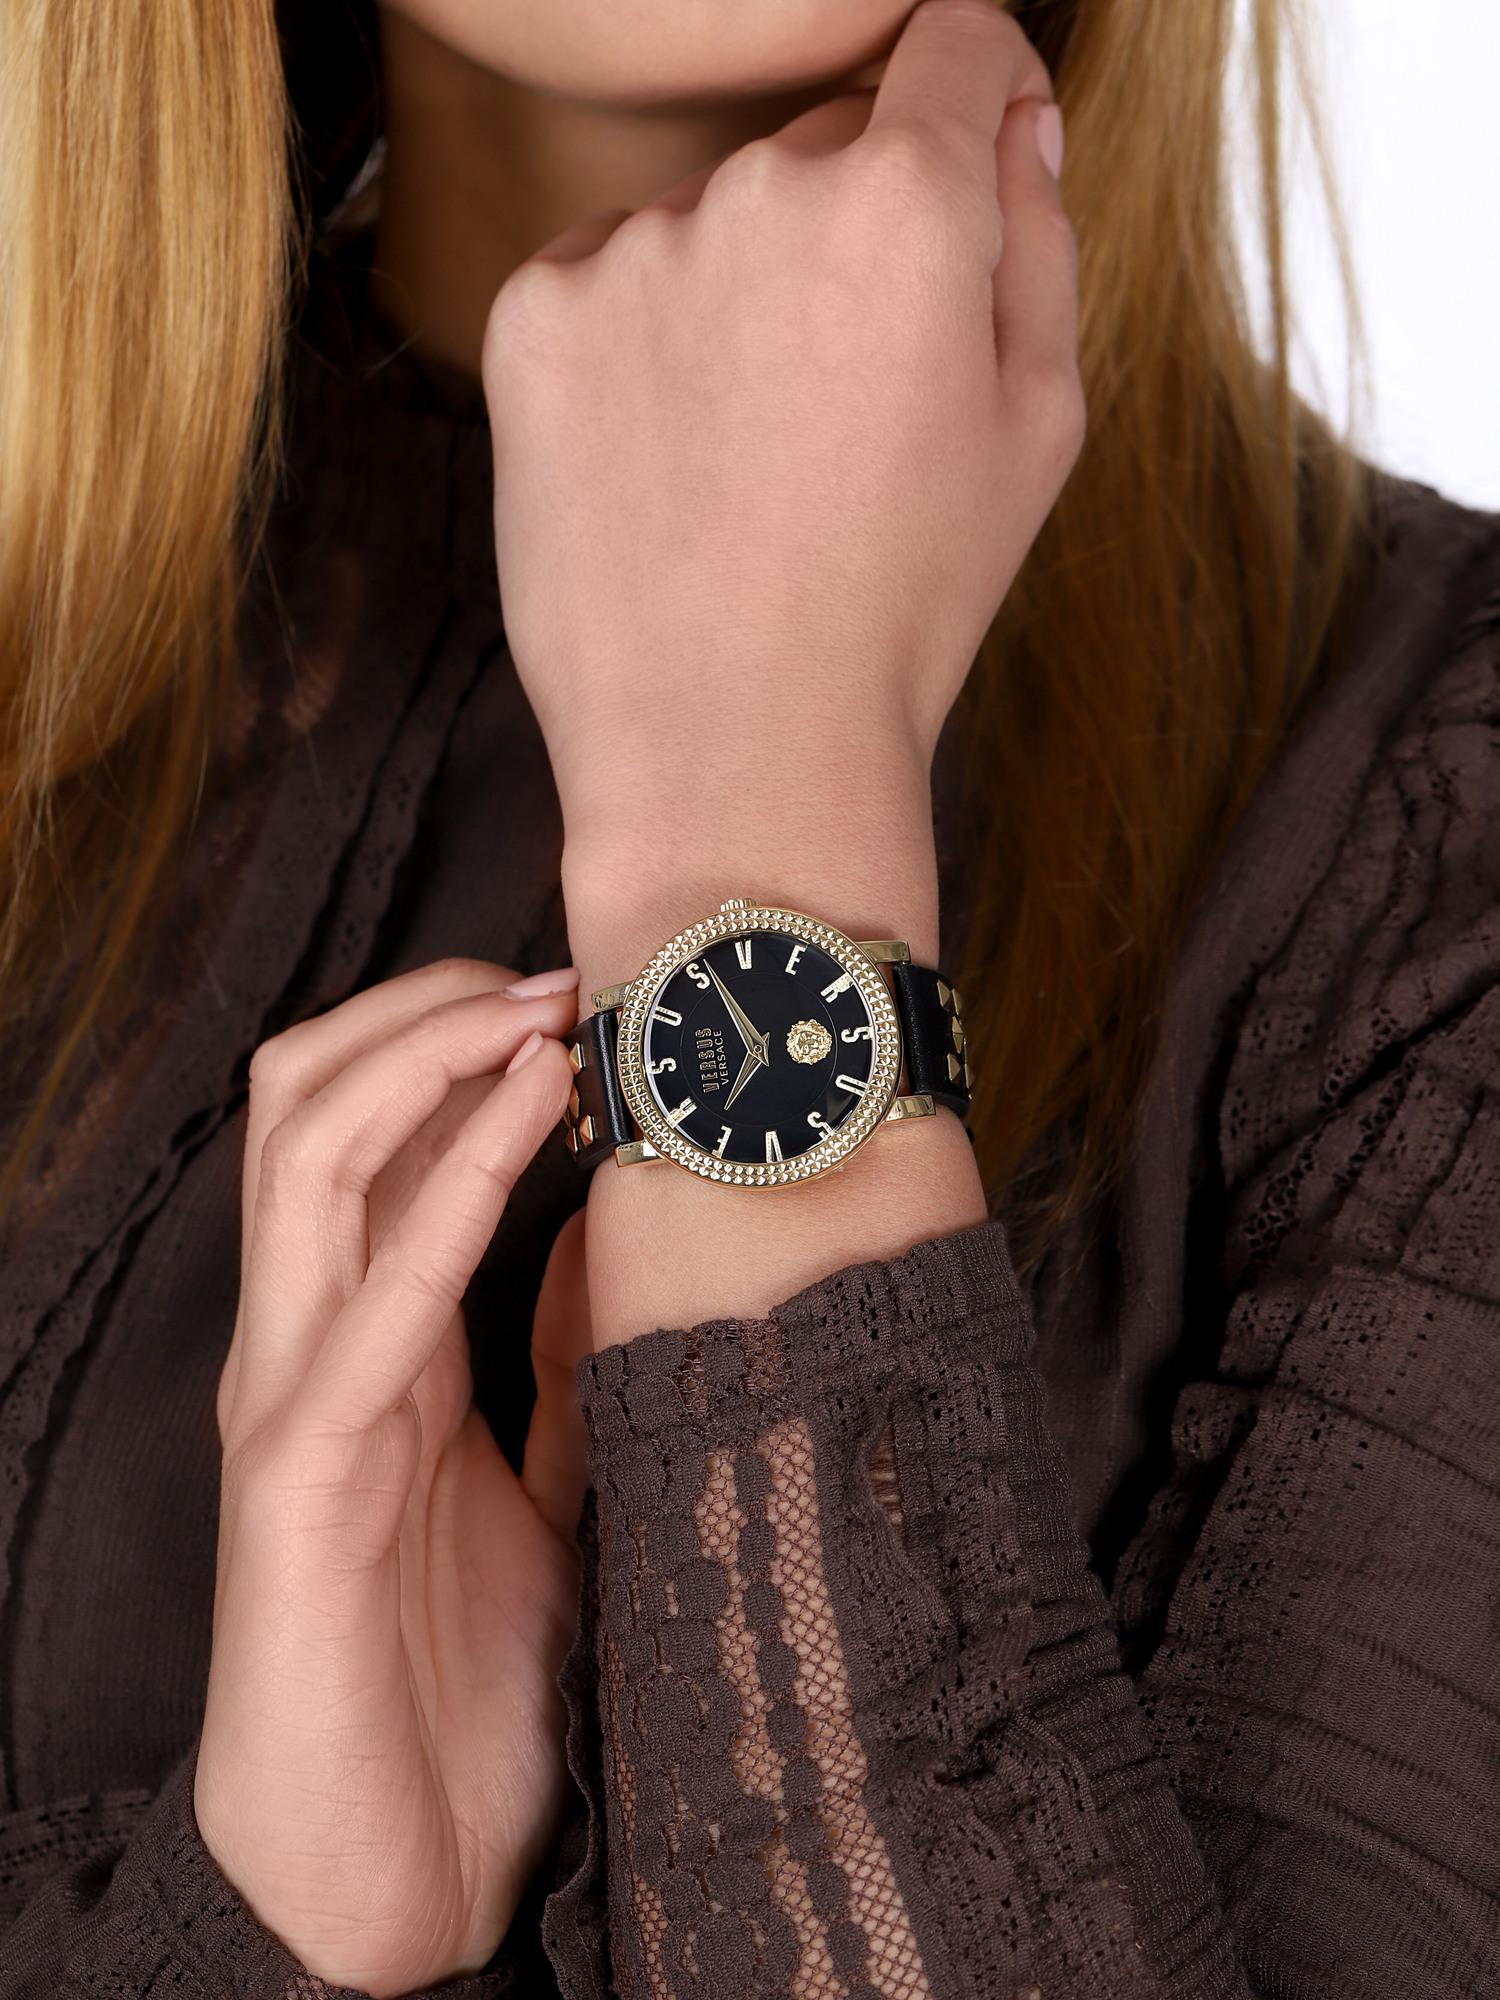 Versus Versace VSPEU0219 zegarek złoty fashion/modowy Damskie pasek